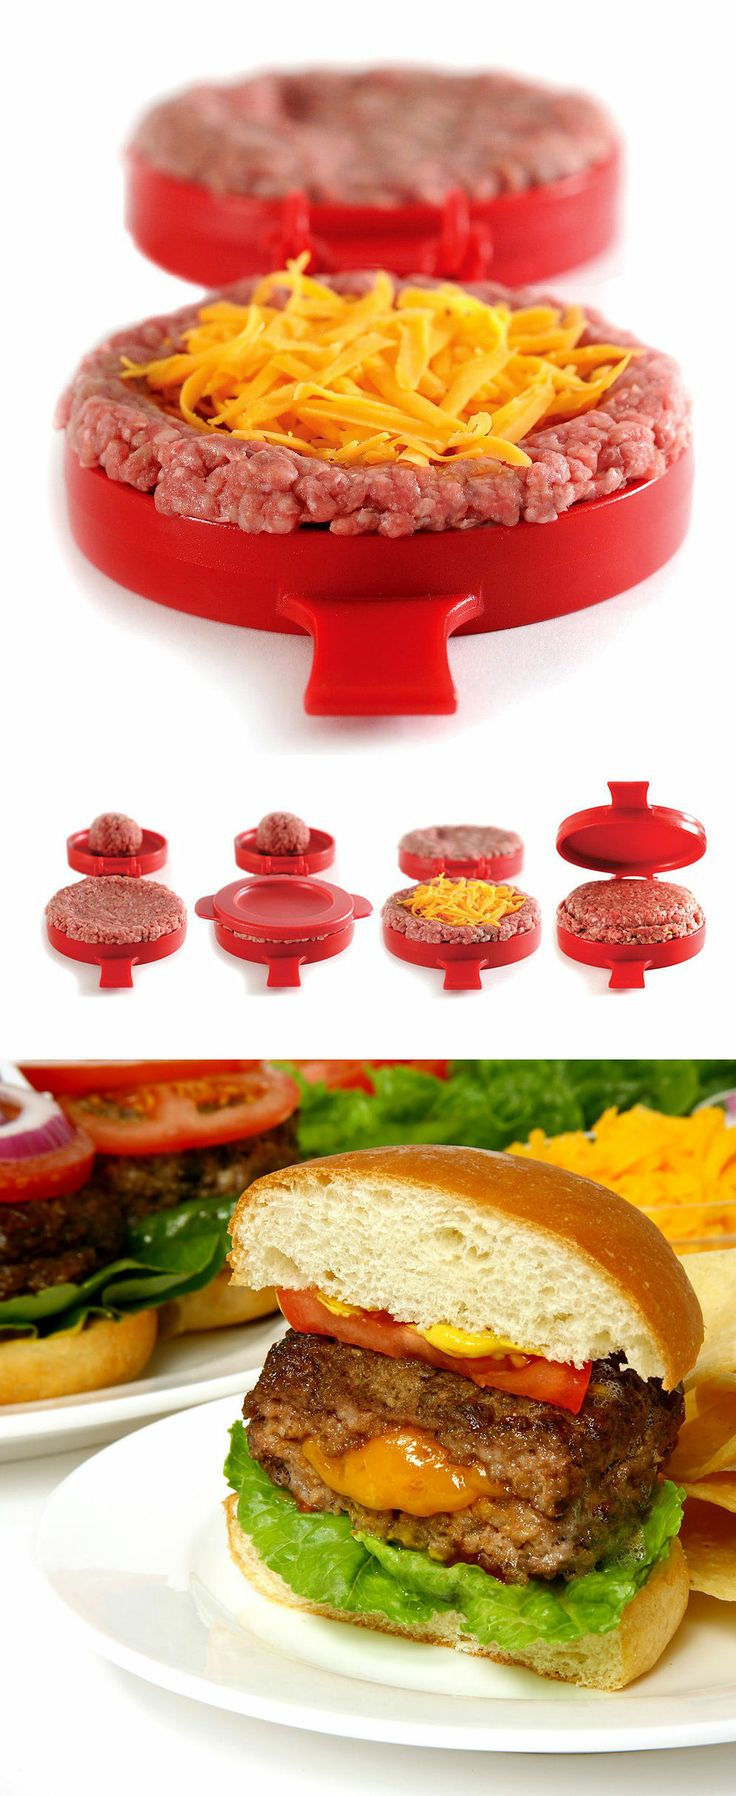 Stuffed Burger Maker // #fathersday #giftidea